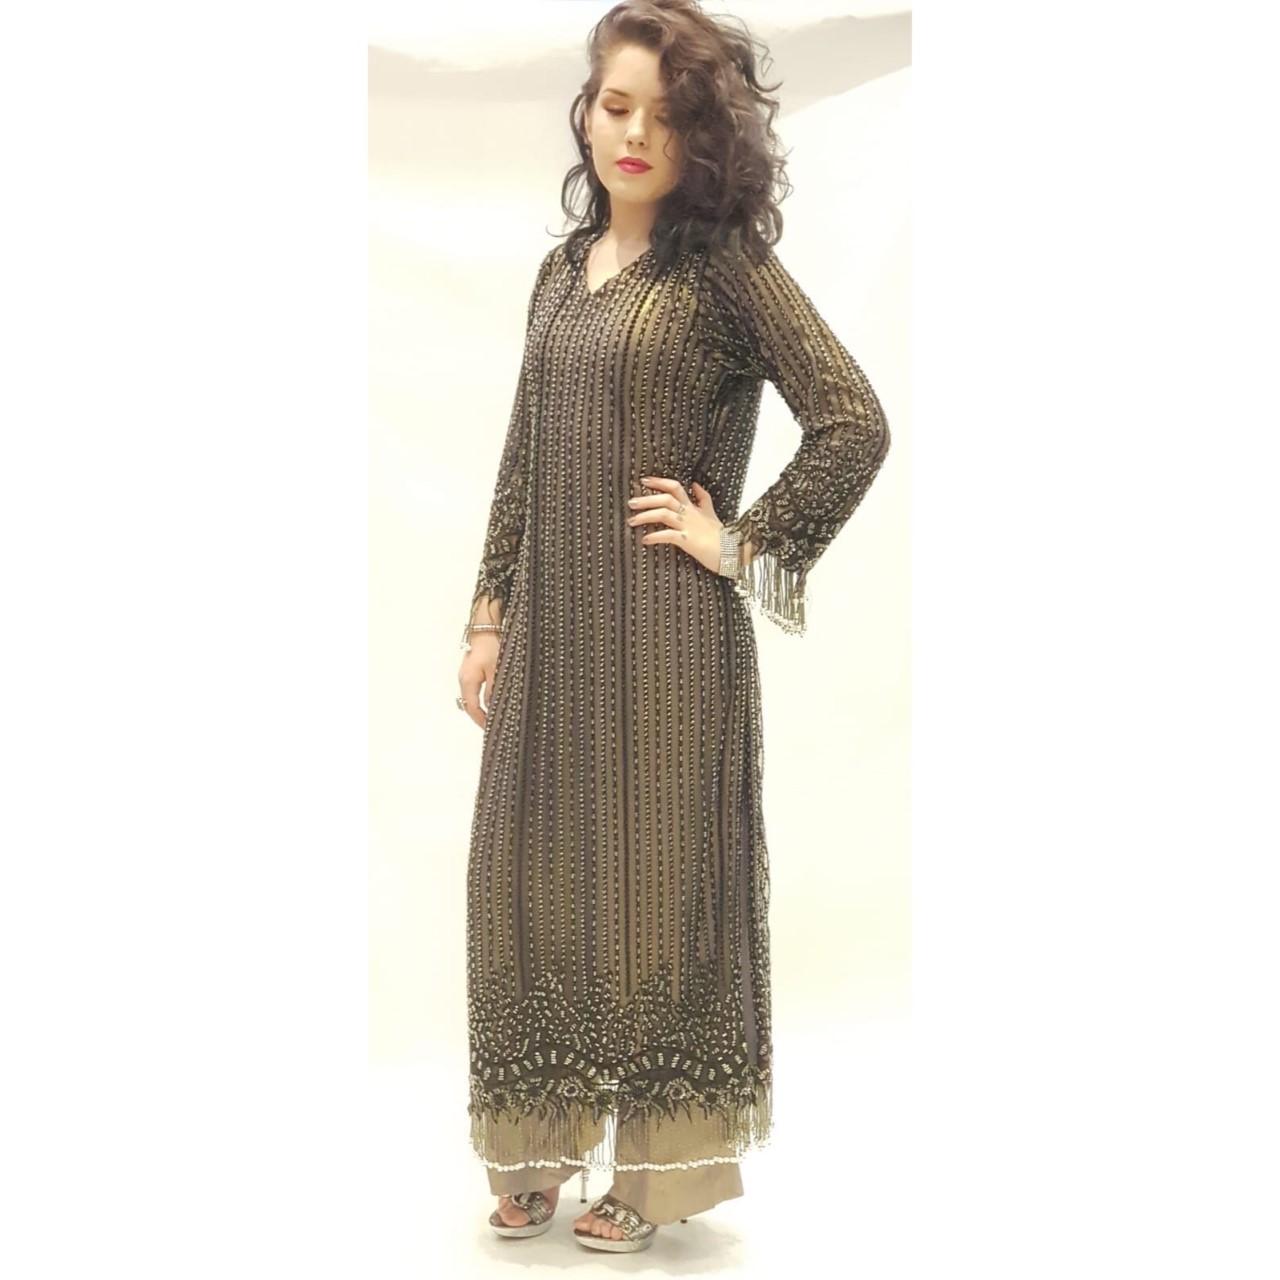 aac9c044e1 Black & Grey Dress - Sarah Zaaraz London Fashion Designer ...